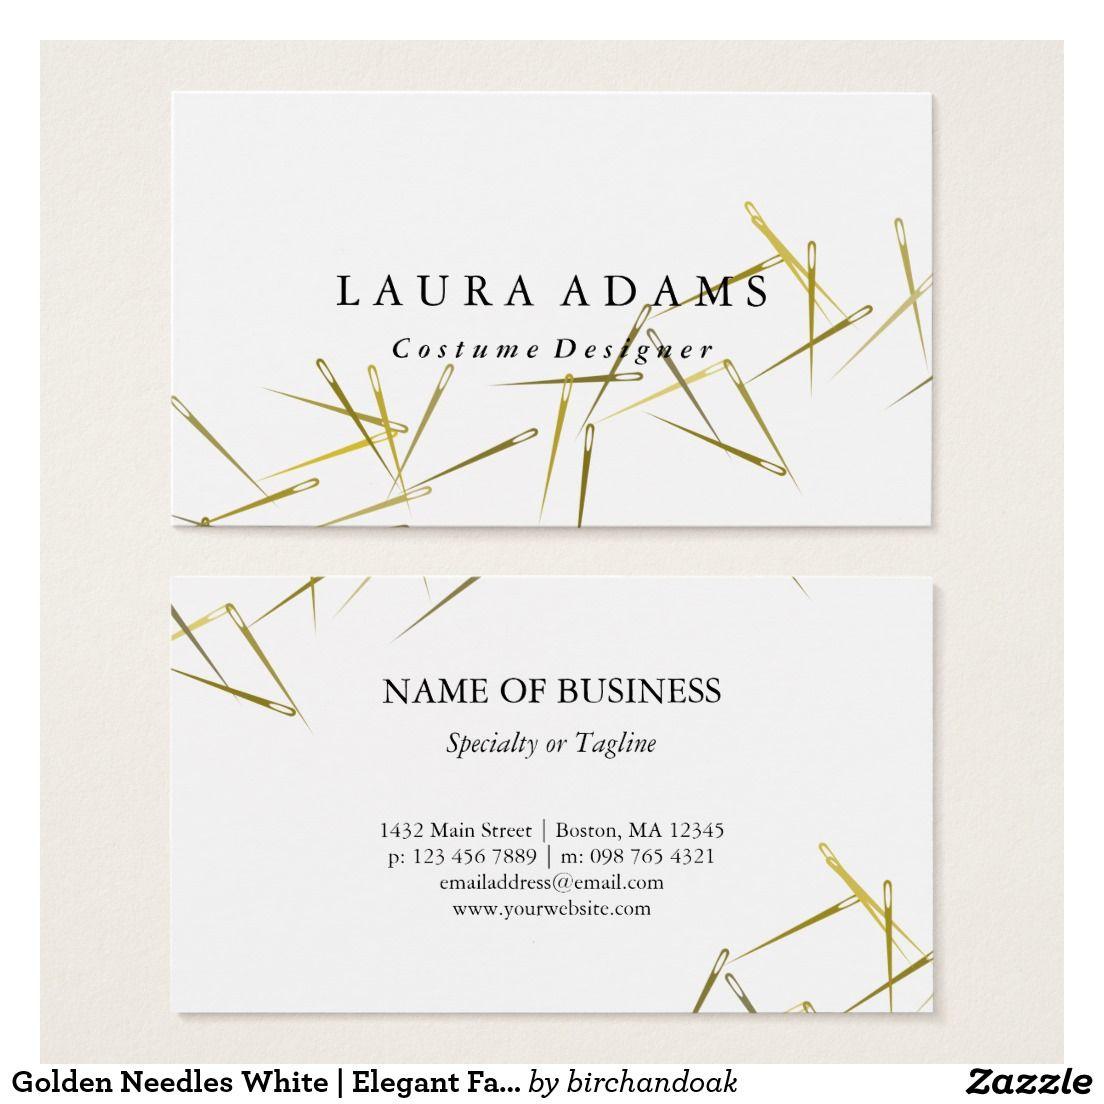 Needles white elegant fashion designer business card golden needles white elegant fashion designer business card magicingreecefo Images